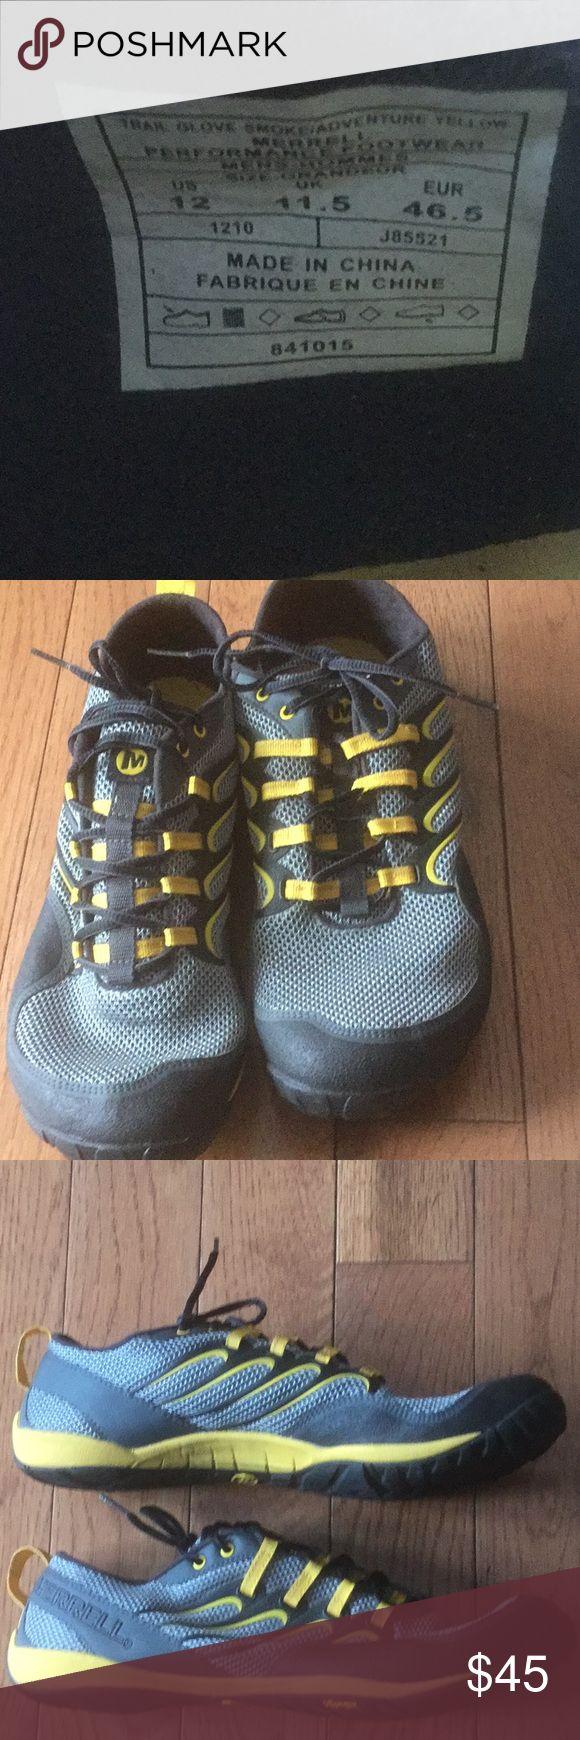 Men's Merrell Shoes Excellent using condition size 12 Merrell Shoes. Make me an offer Merrell Shoes